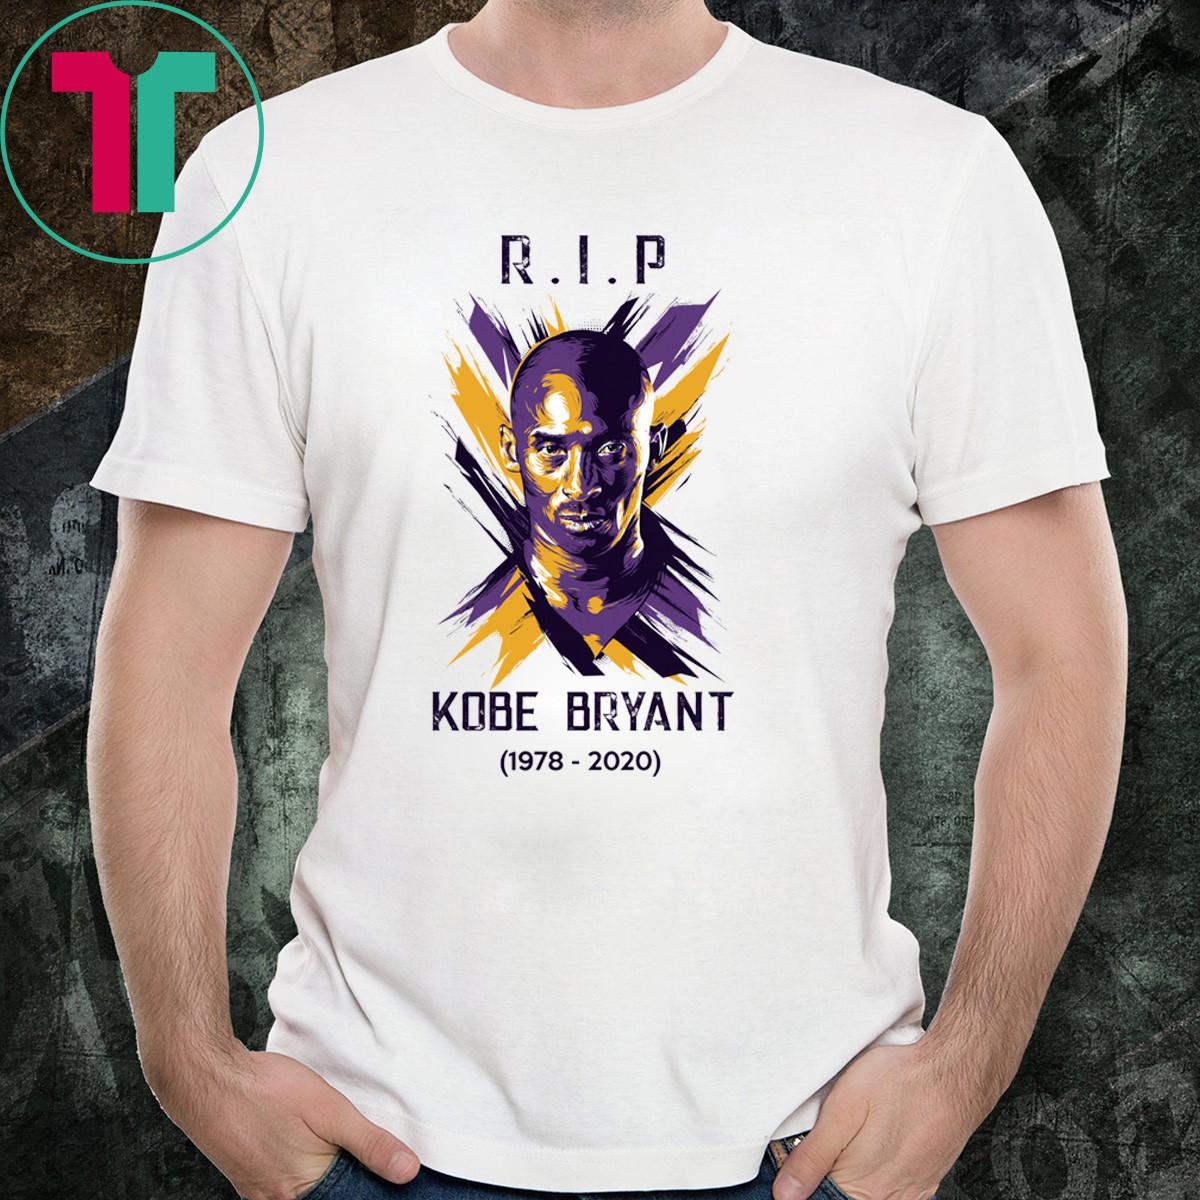 RIP Kobe Bryant T-Shirt Limited Eiditon